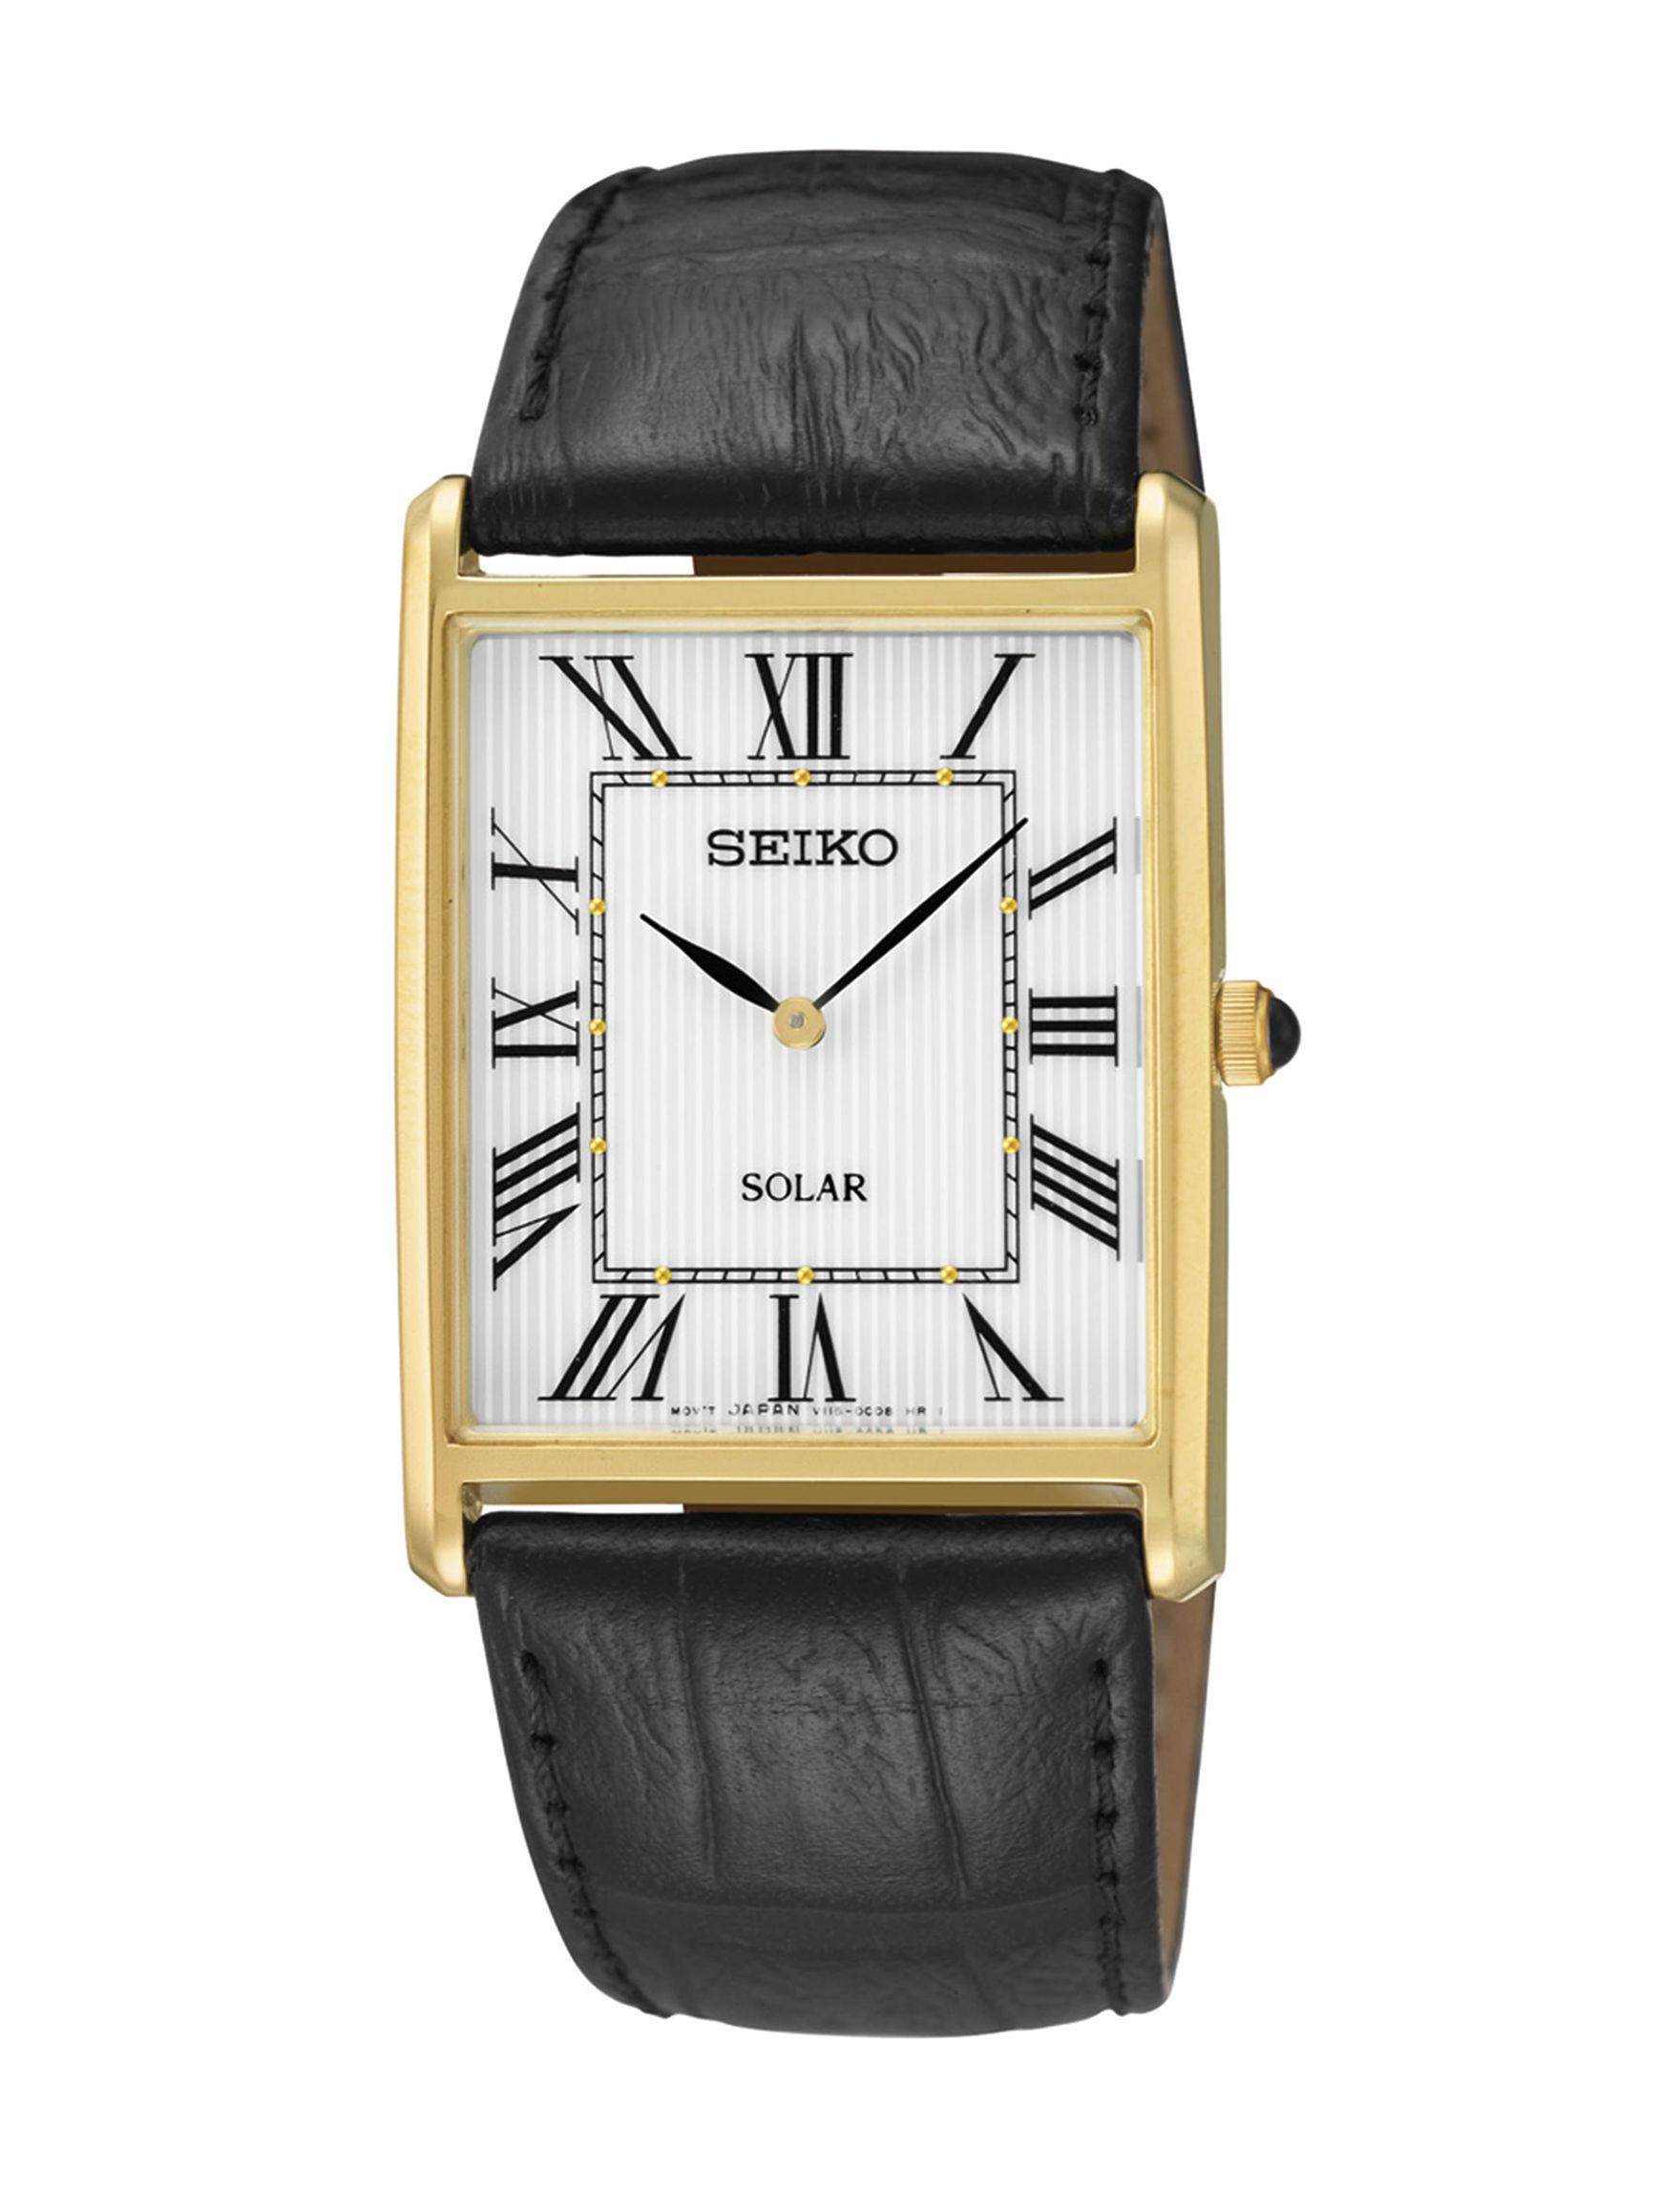 Seiko Gold Fashion Watches